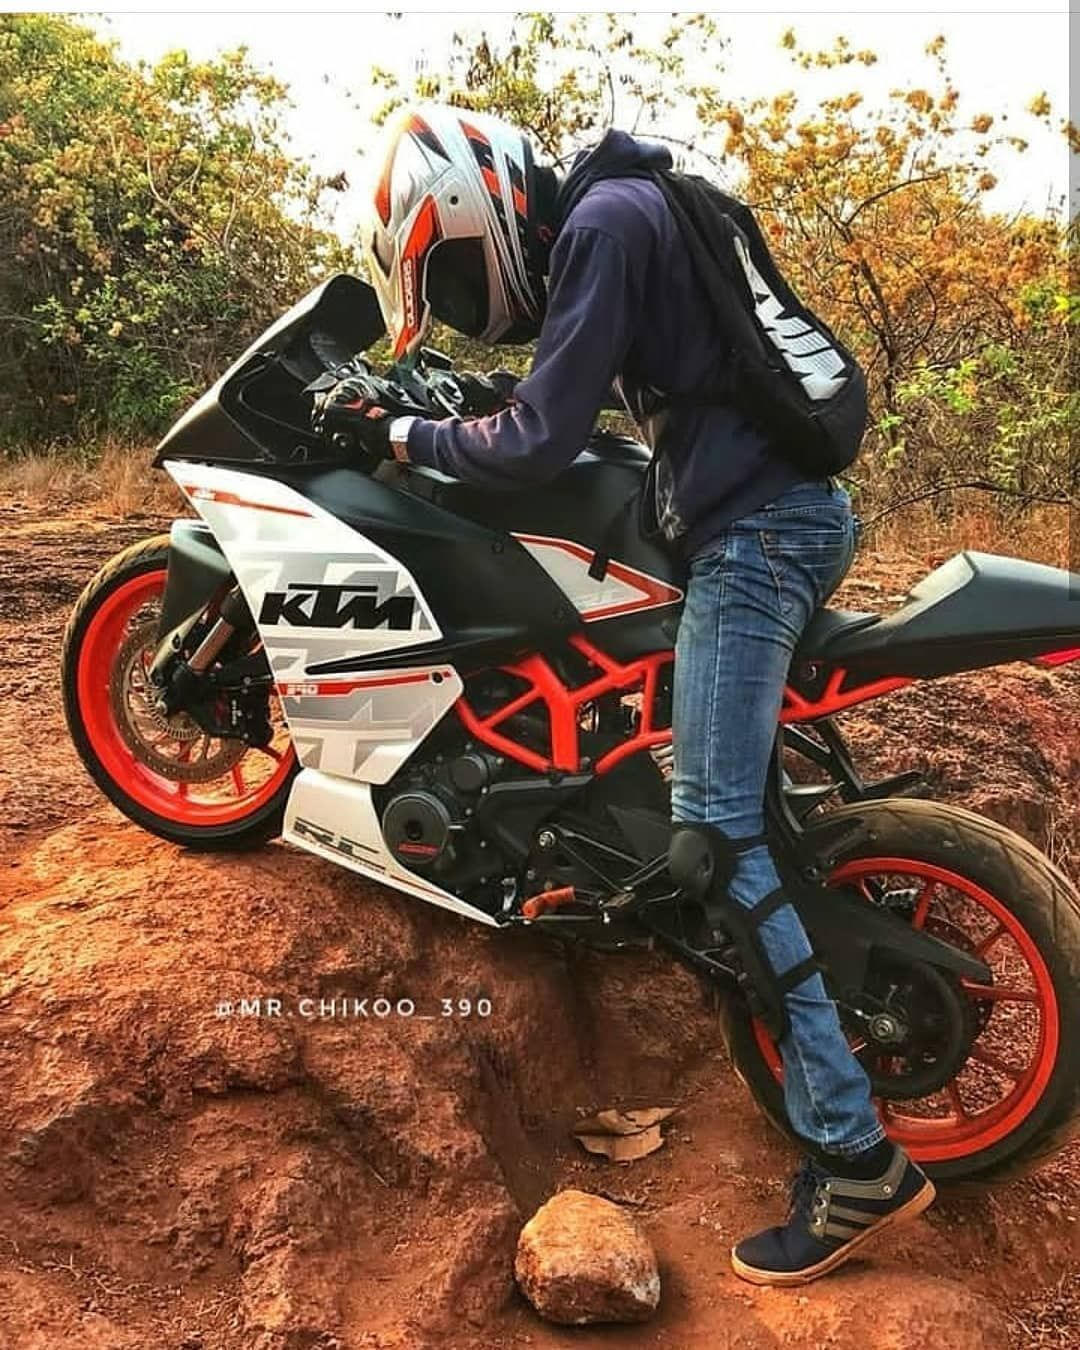 Pin By Francisco Relvas On Rolantes Ktm Ktm Rc Duke Motorcycle